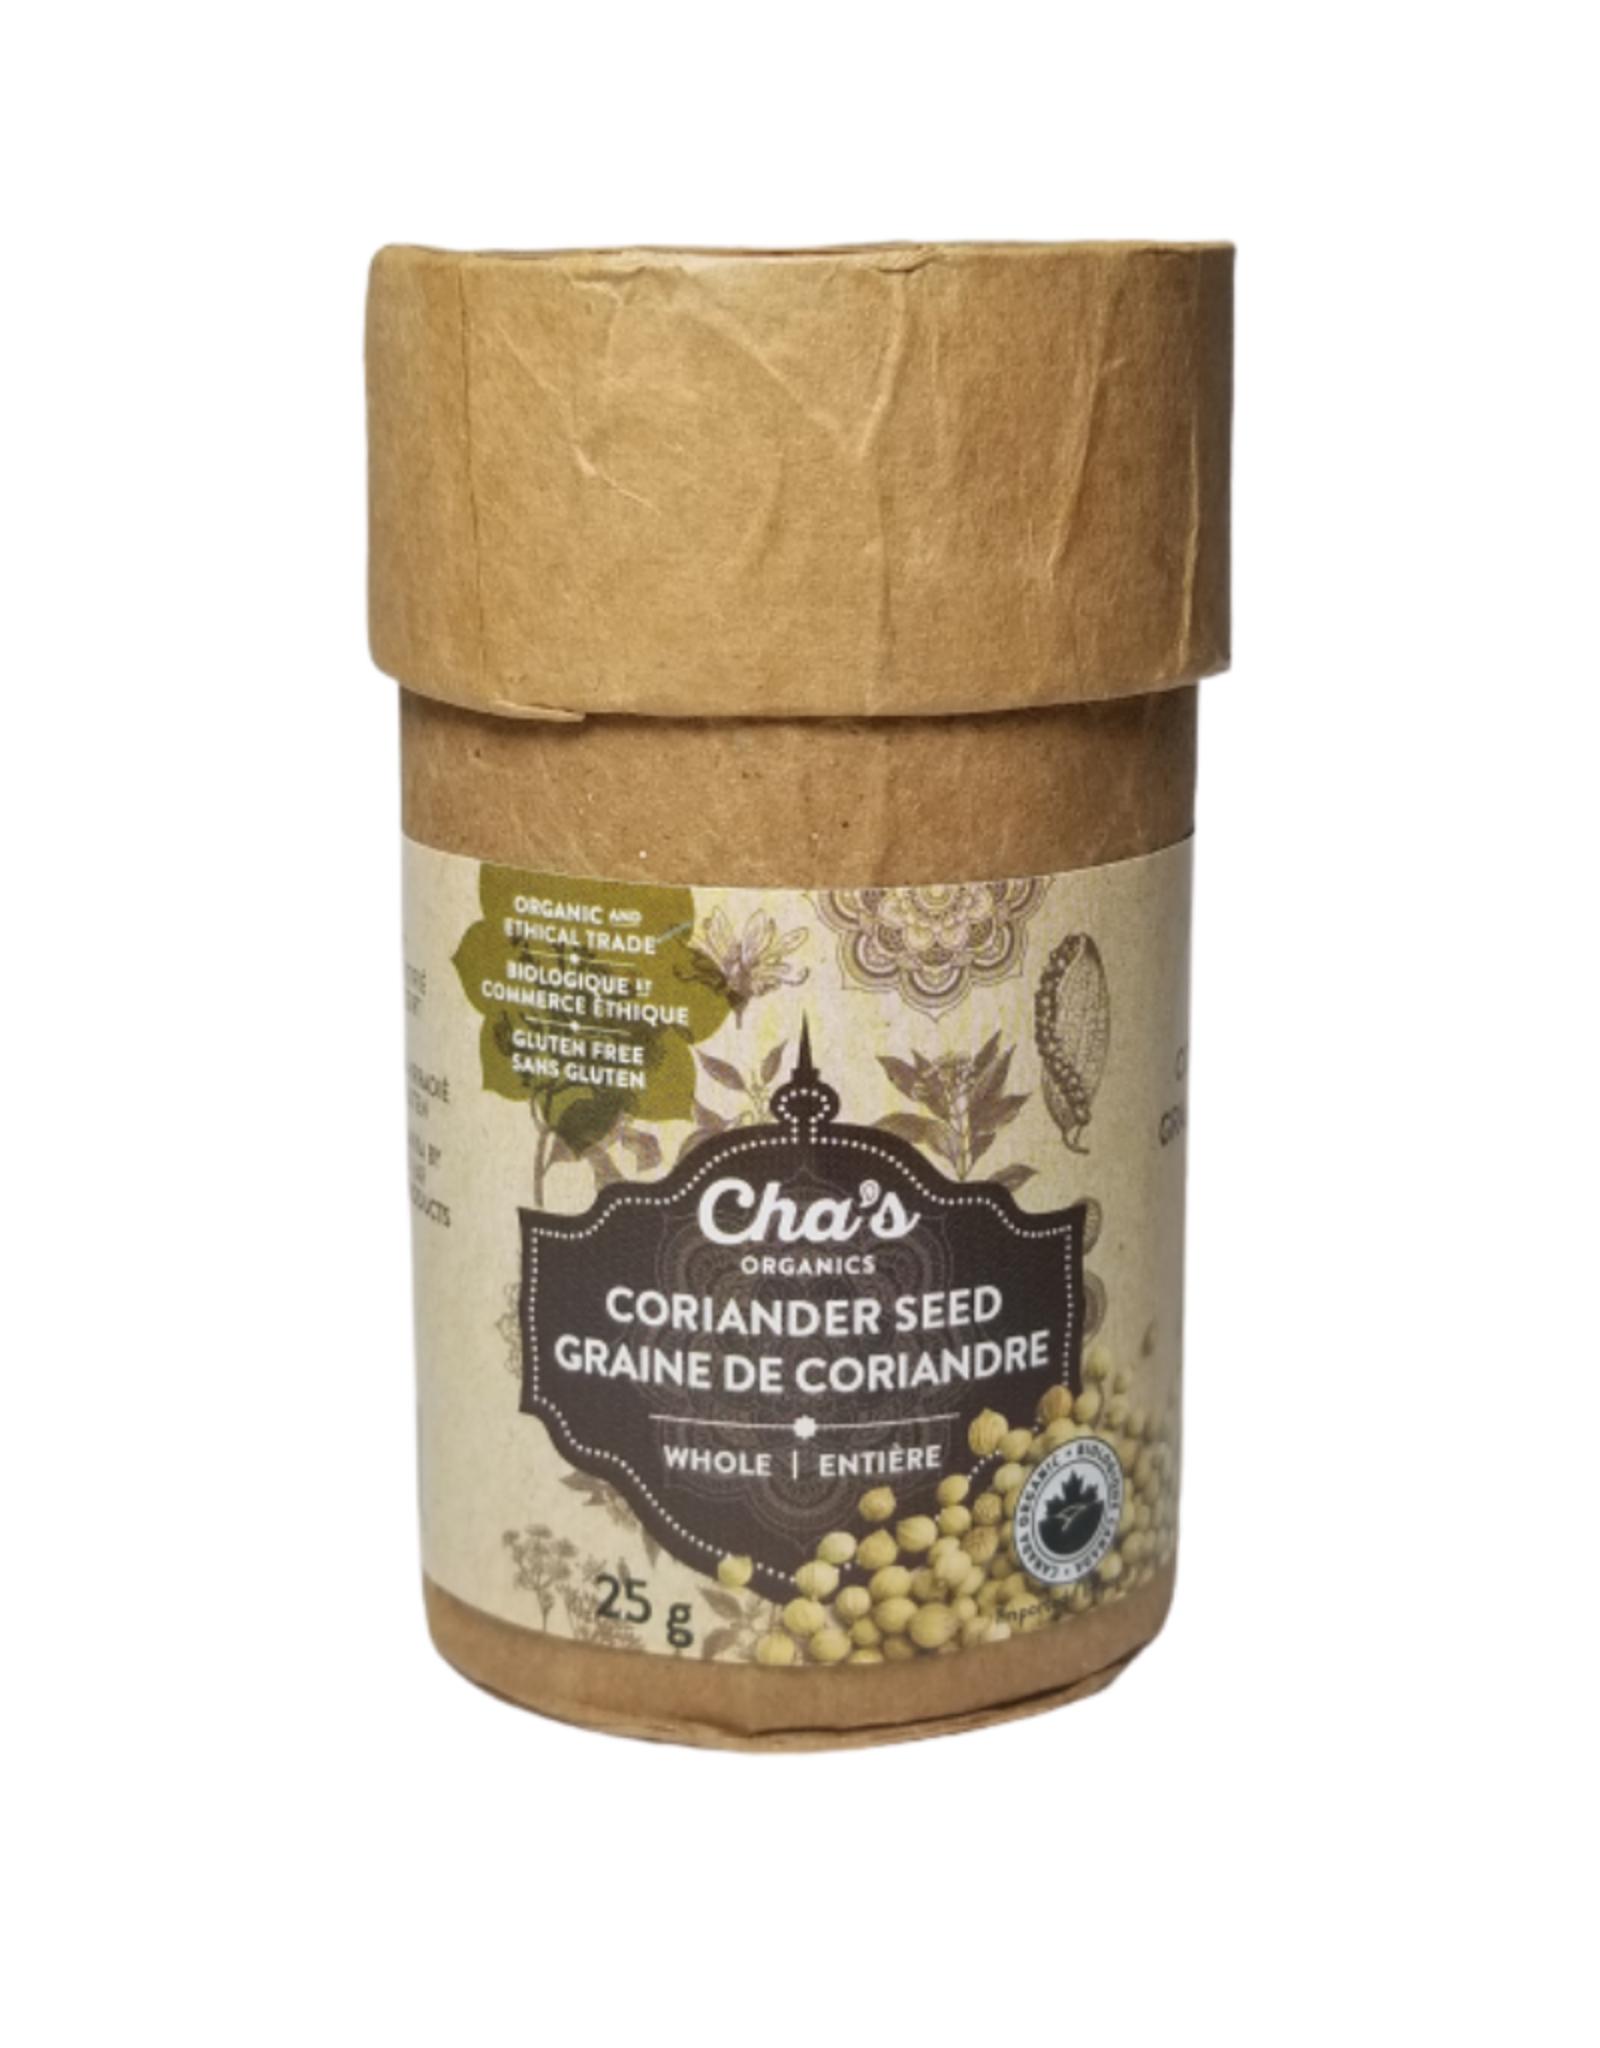 Cha's Organics Cha's Coriander Seed